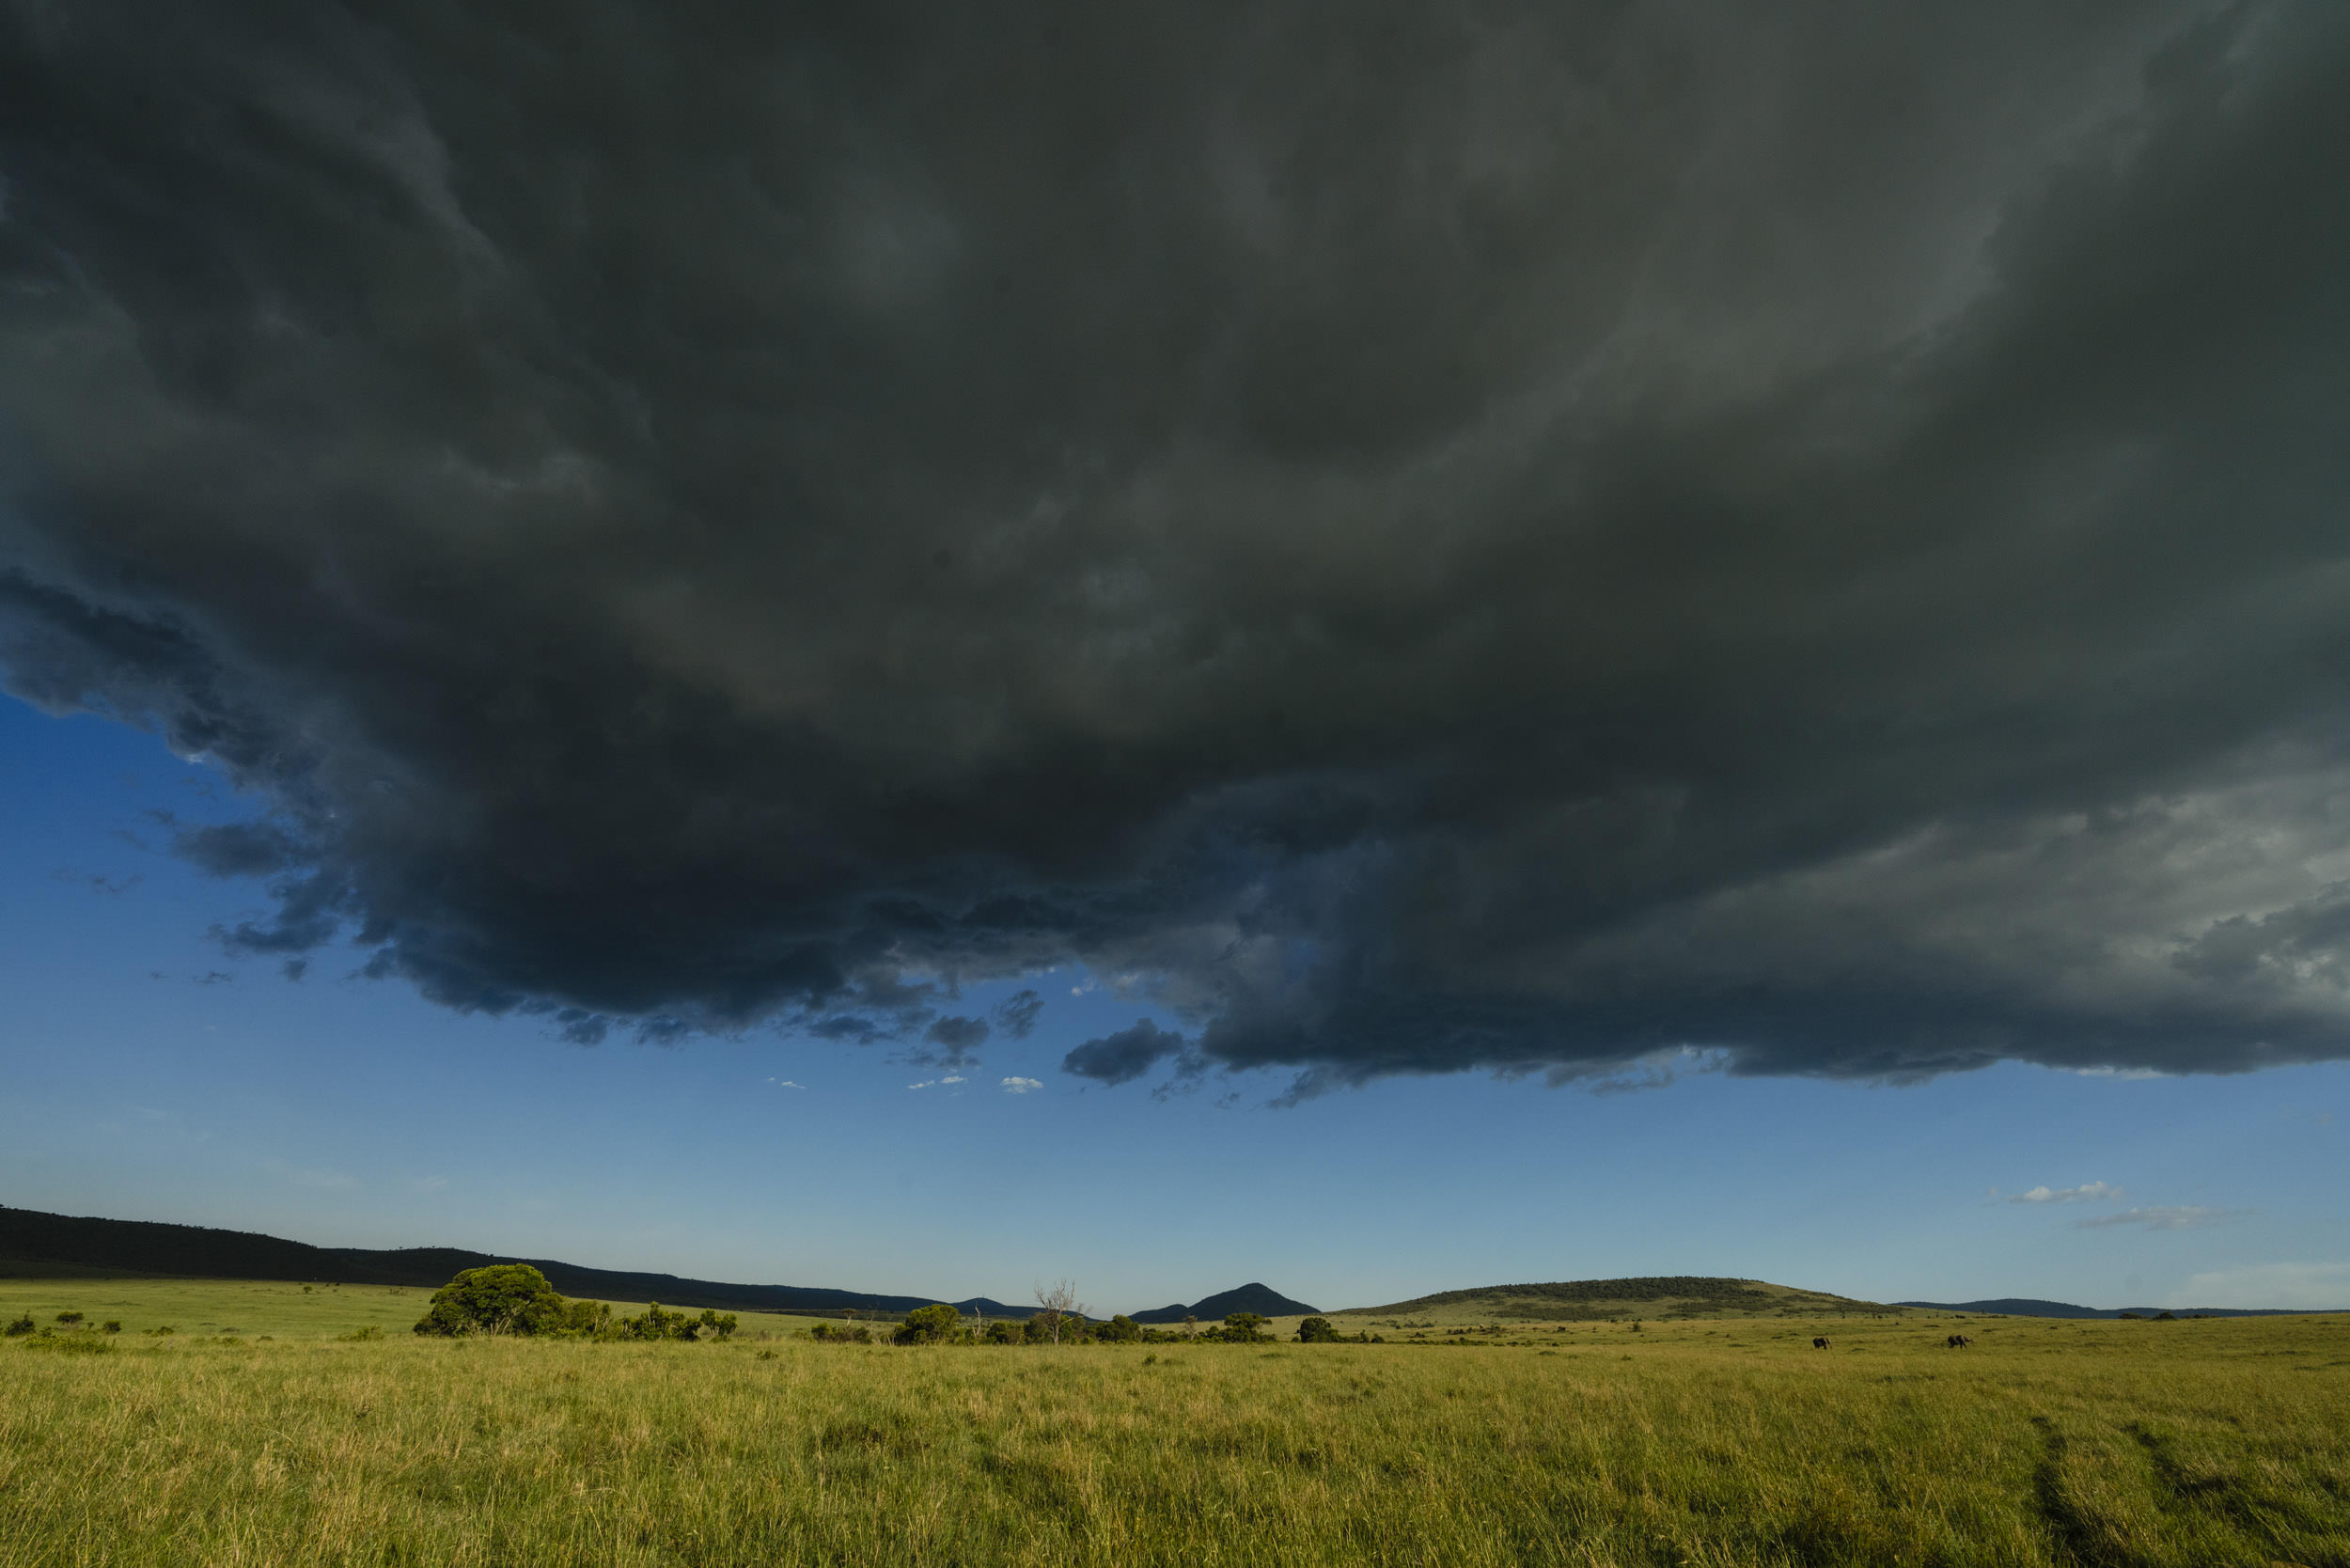 Stormy sky over masai mara.jpg